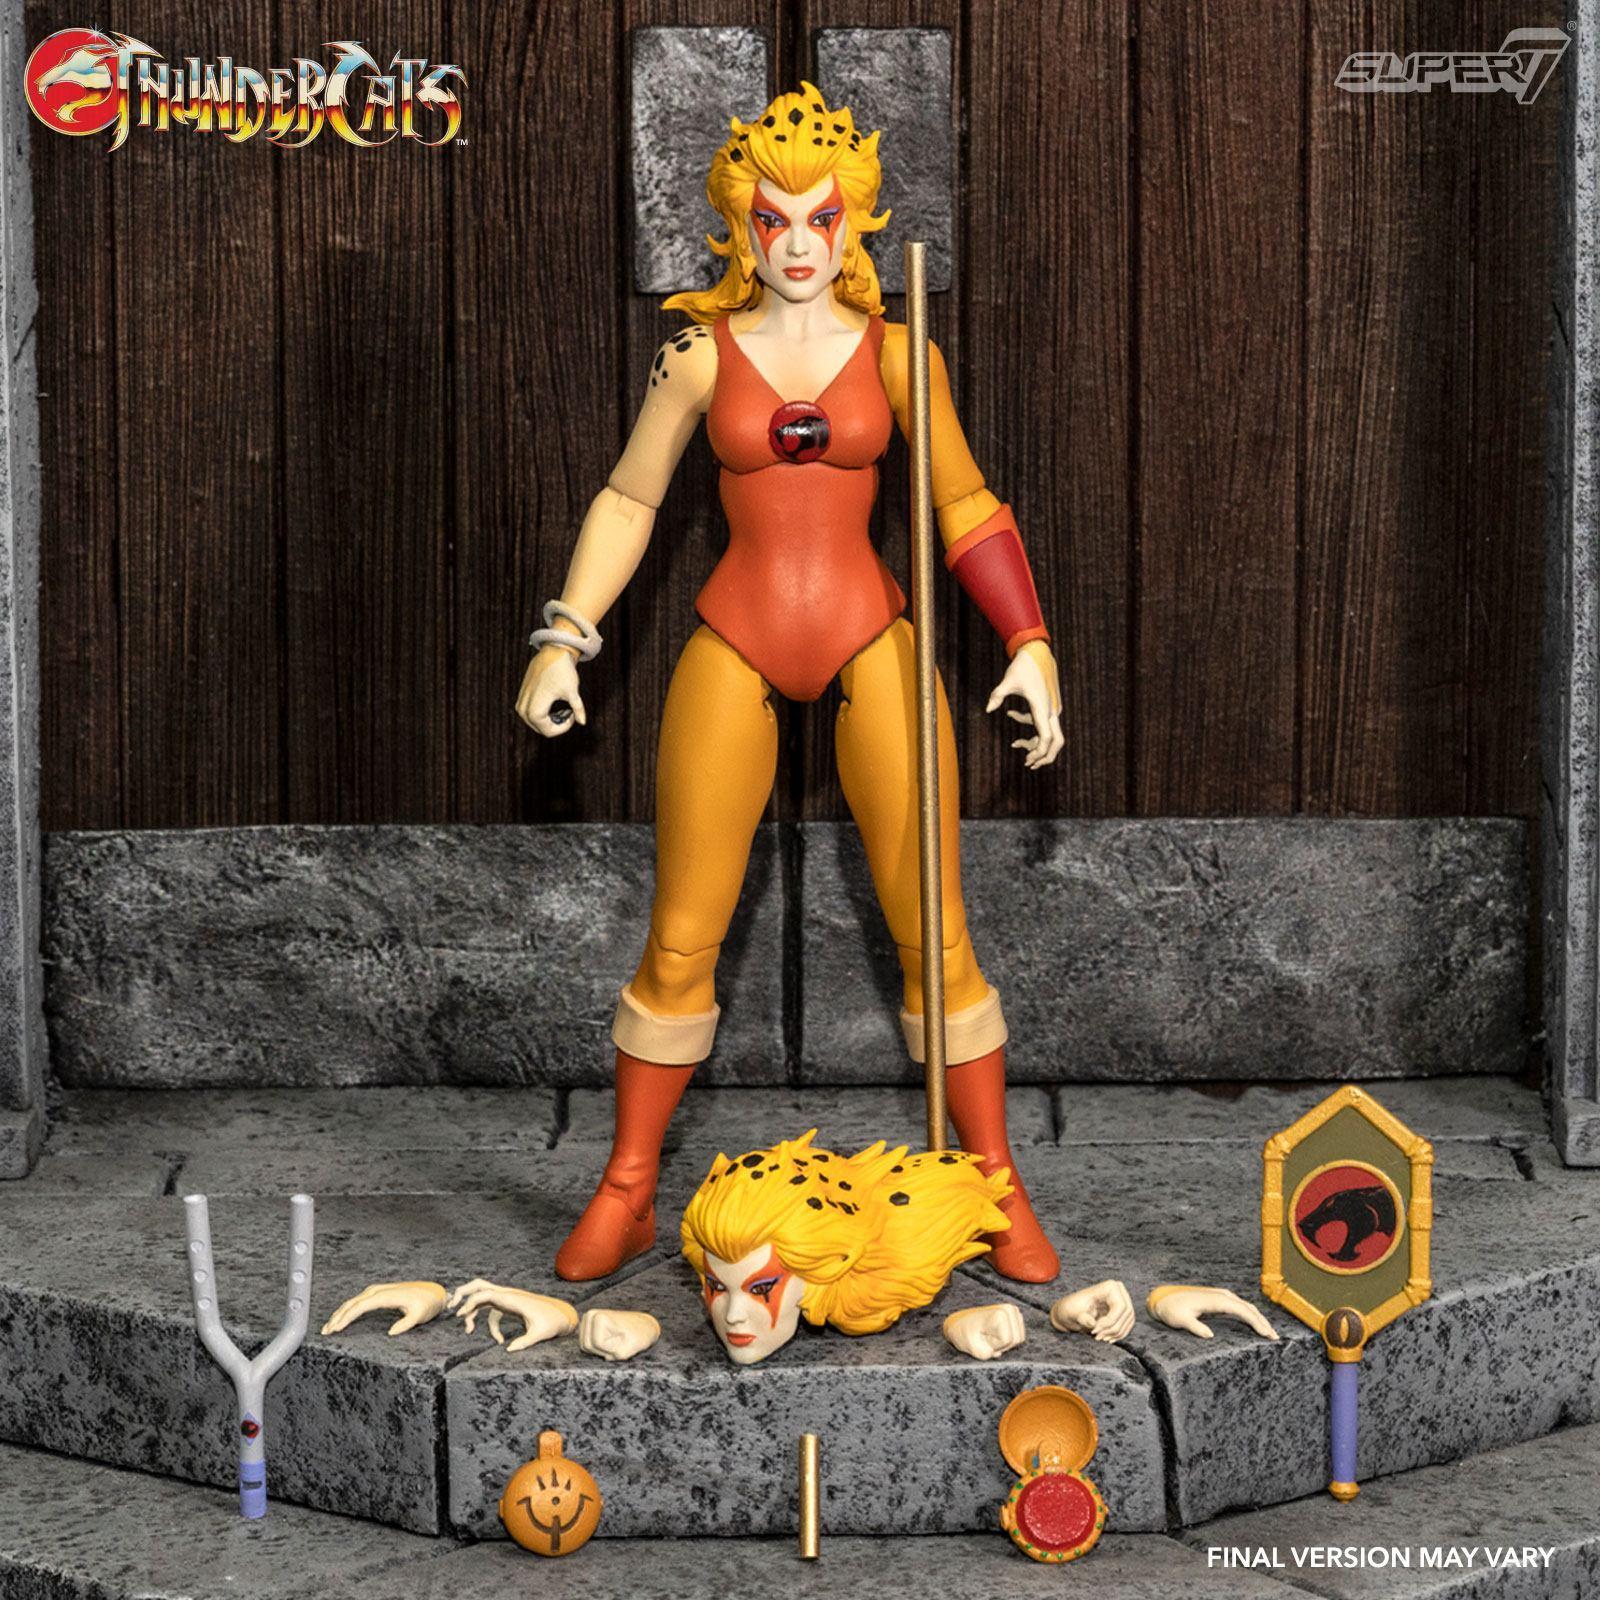 Thundercats wave 3 figurine ultimates cheetara the super speedy thundercats warrior 18 cm super7 suukoo toys